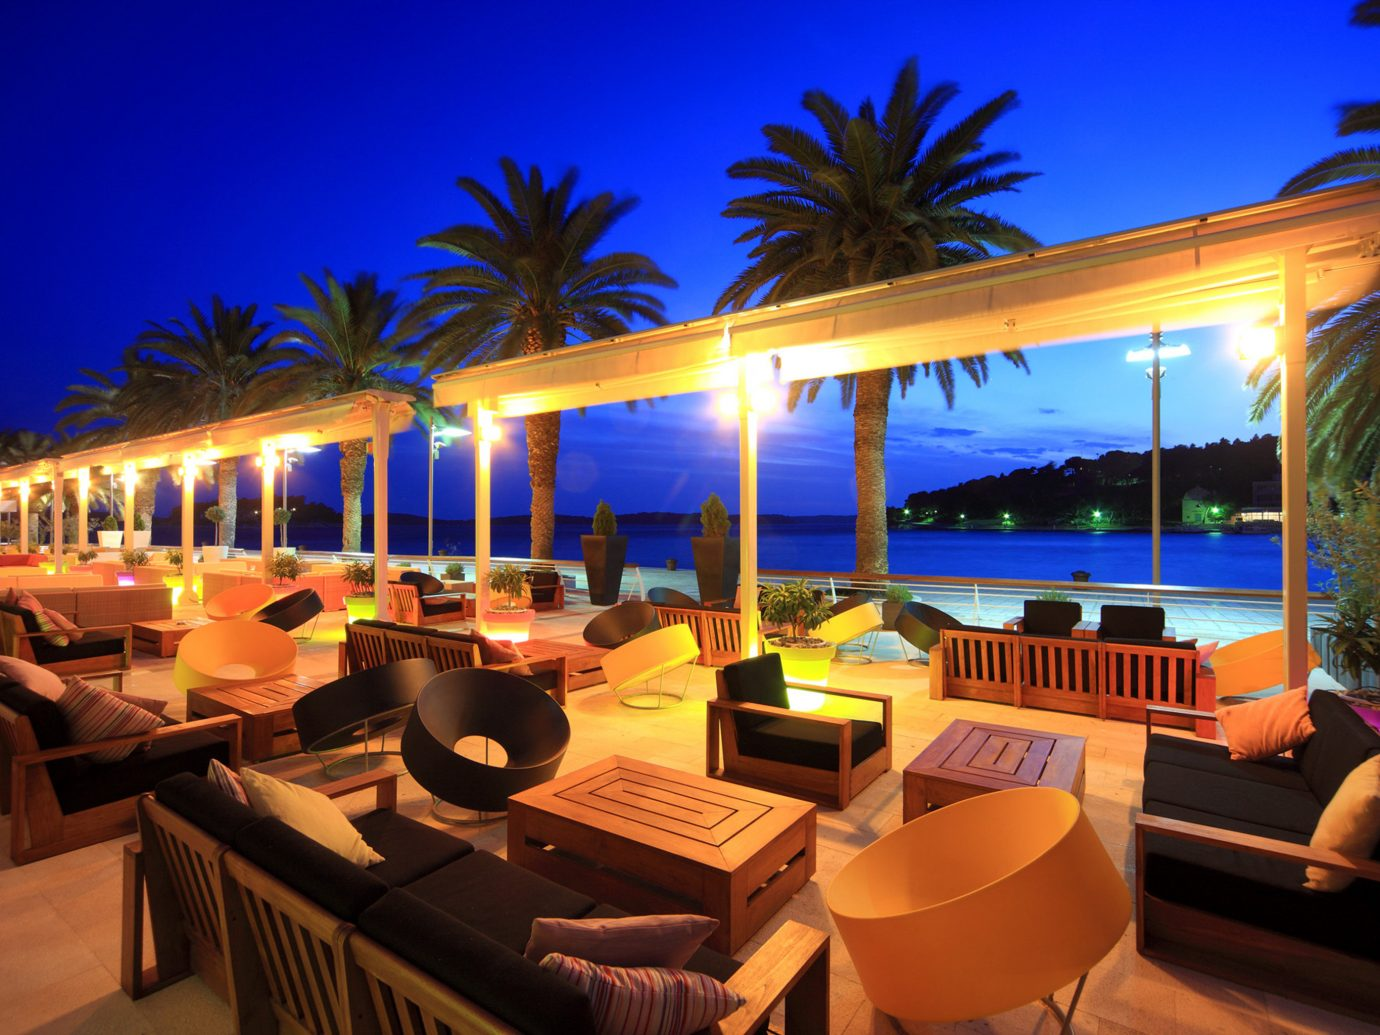 Drink Lounge Nightlife Pool Scenic views Trip Ideas Tropical Resort restaurant vacation estate Villa night